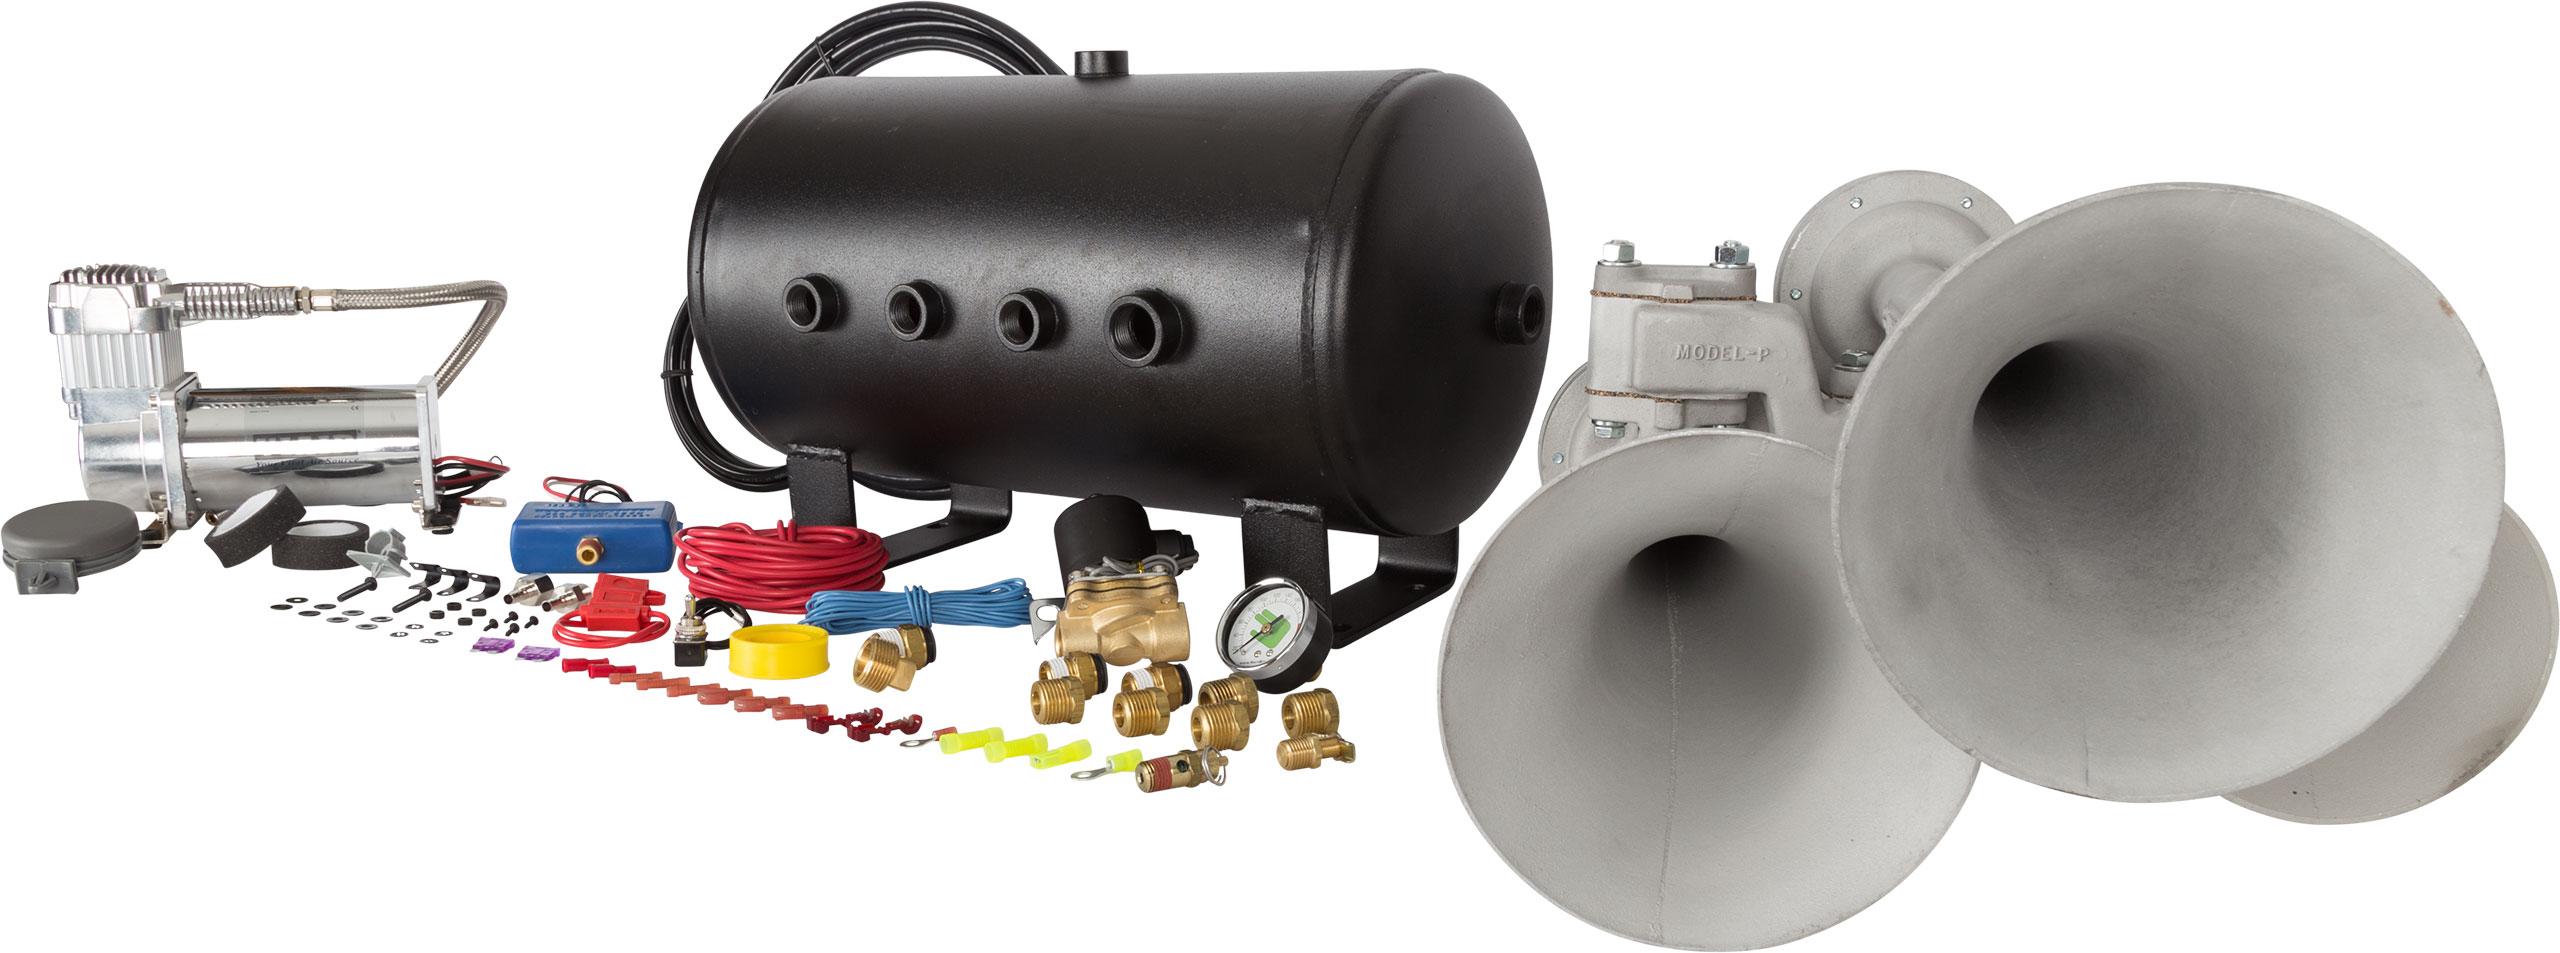 Hornblasters airchime p3 540 train horn kit airchime p3 540 train horn kit photo publicscrutiny Choice Image